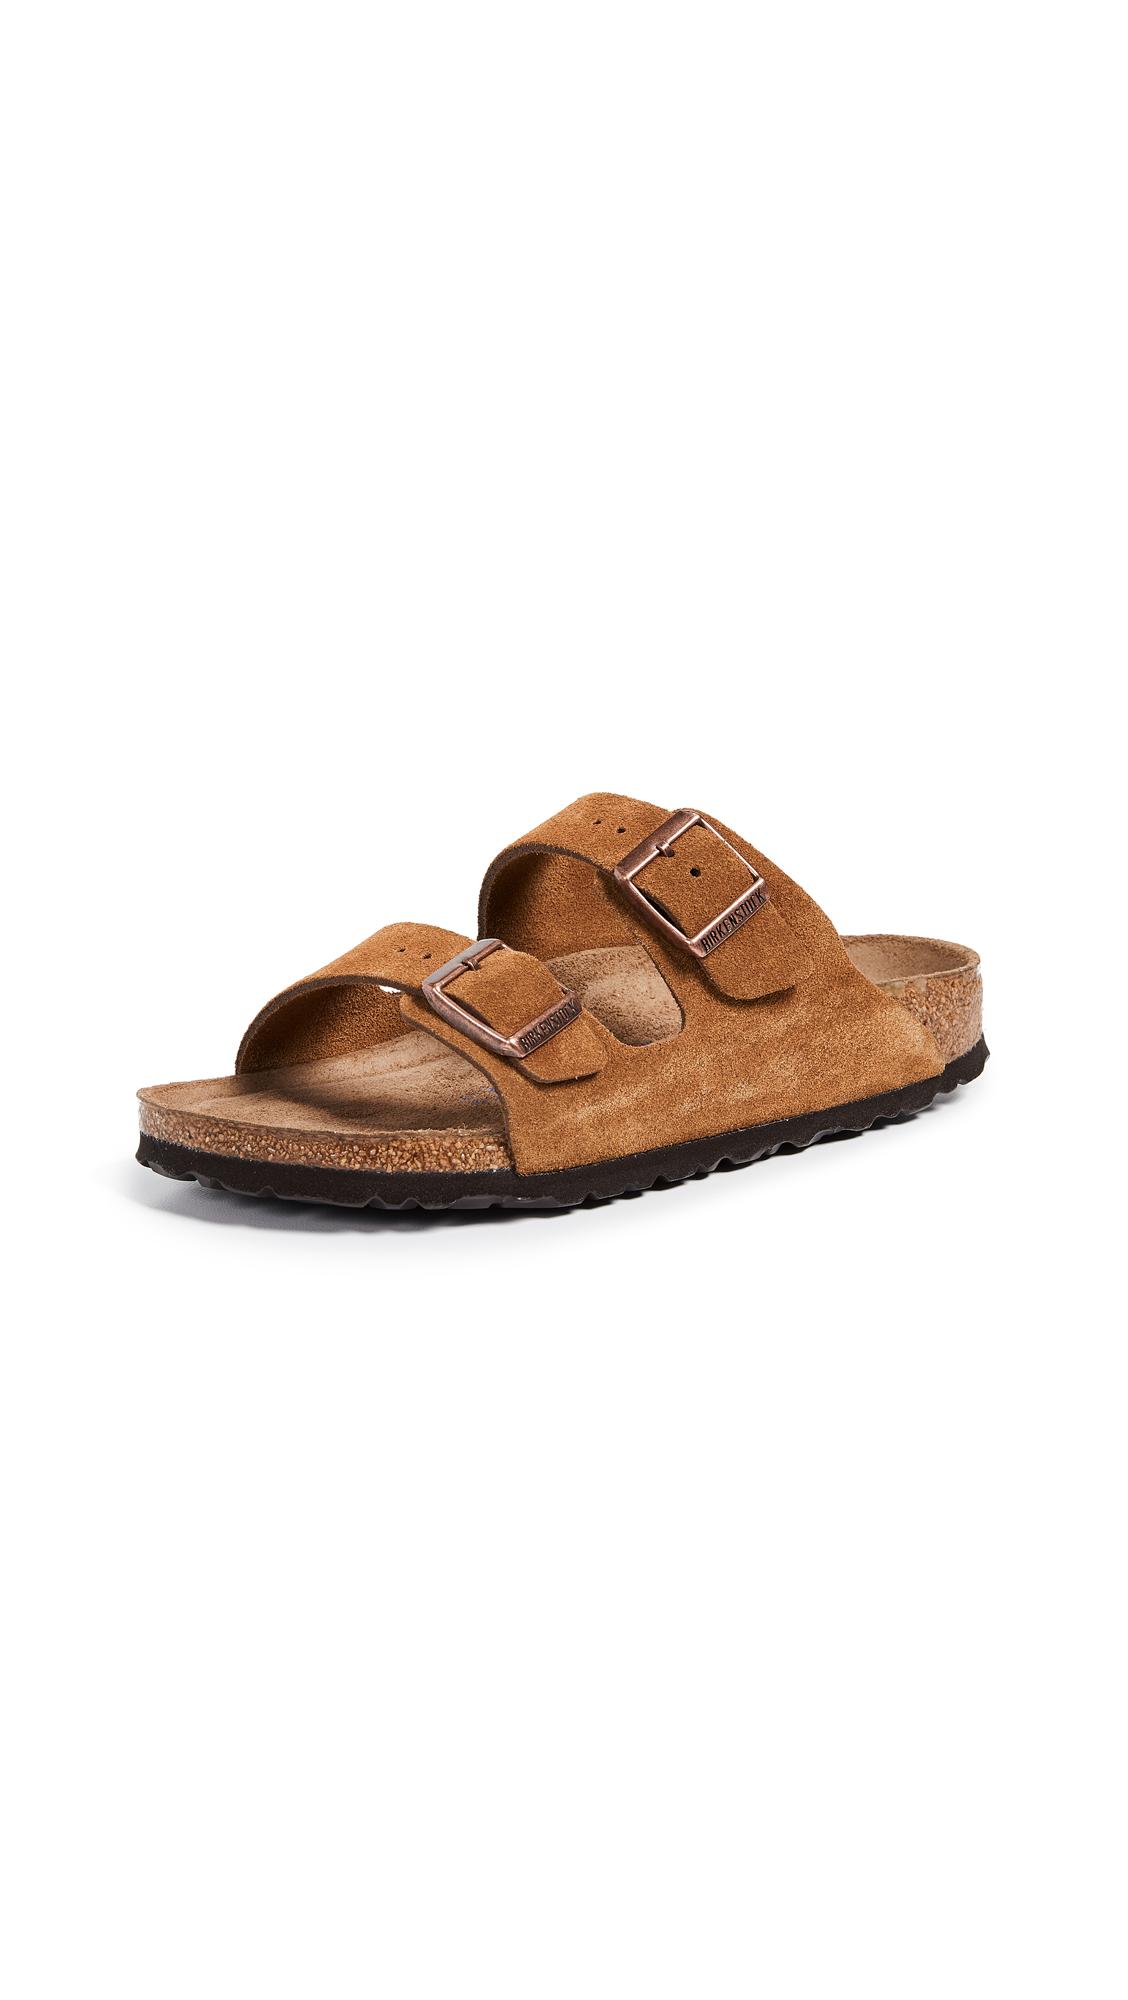 Birkenstock Arizona SFB Sandals - Mink